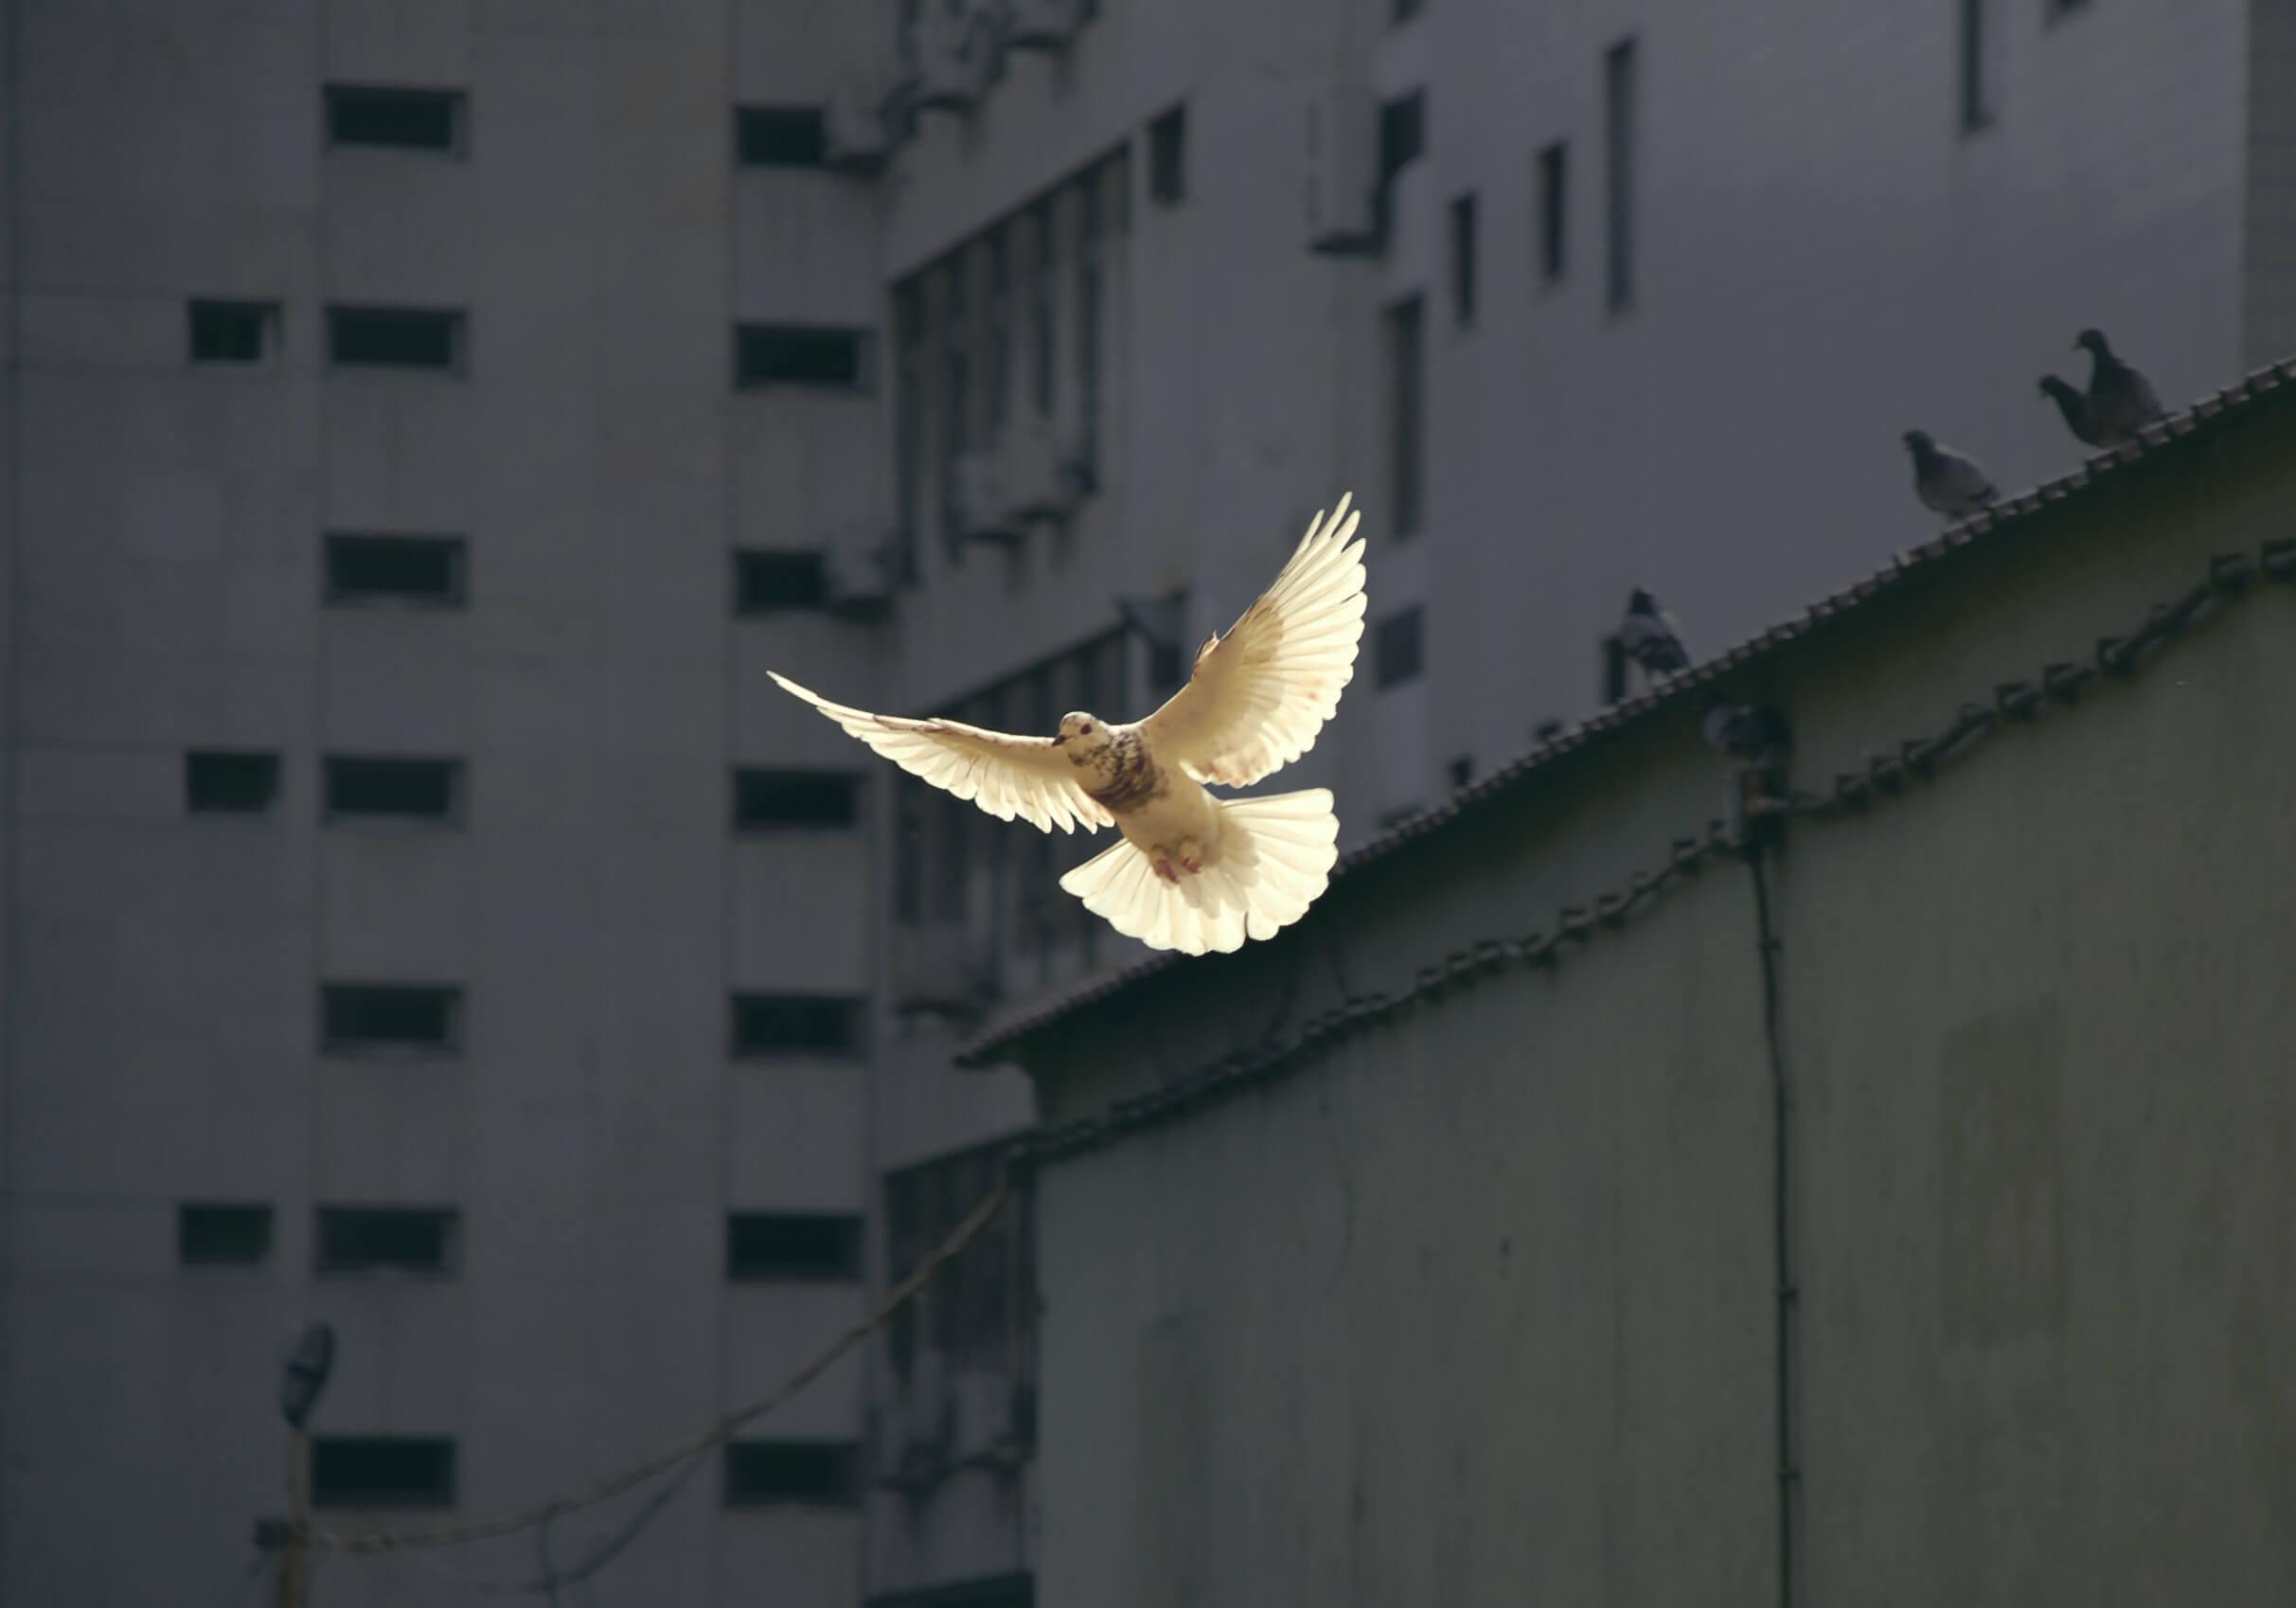 De witte duif onder de zwarte zwanen